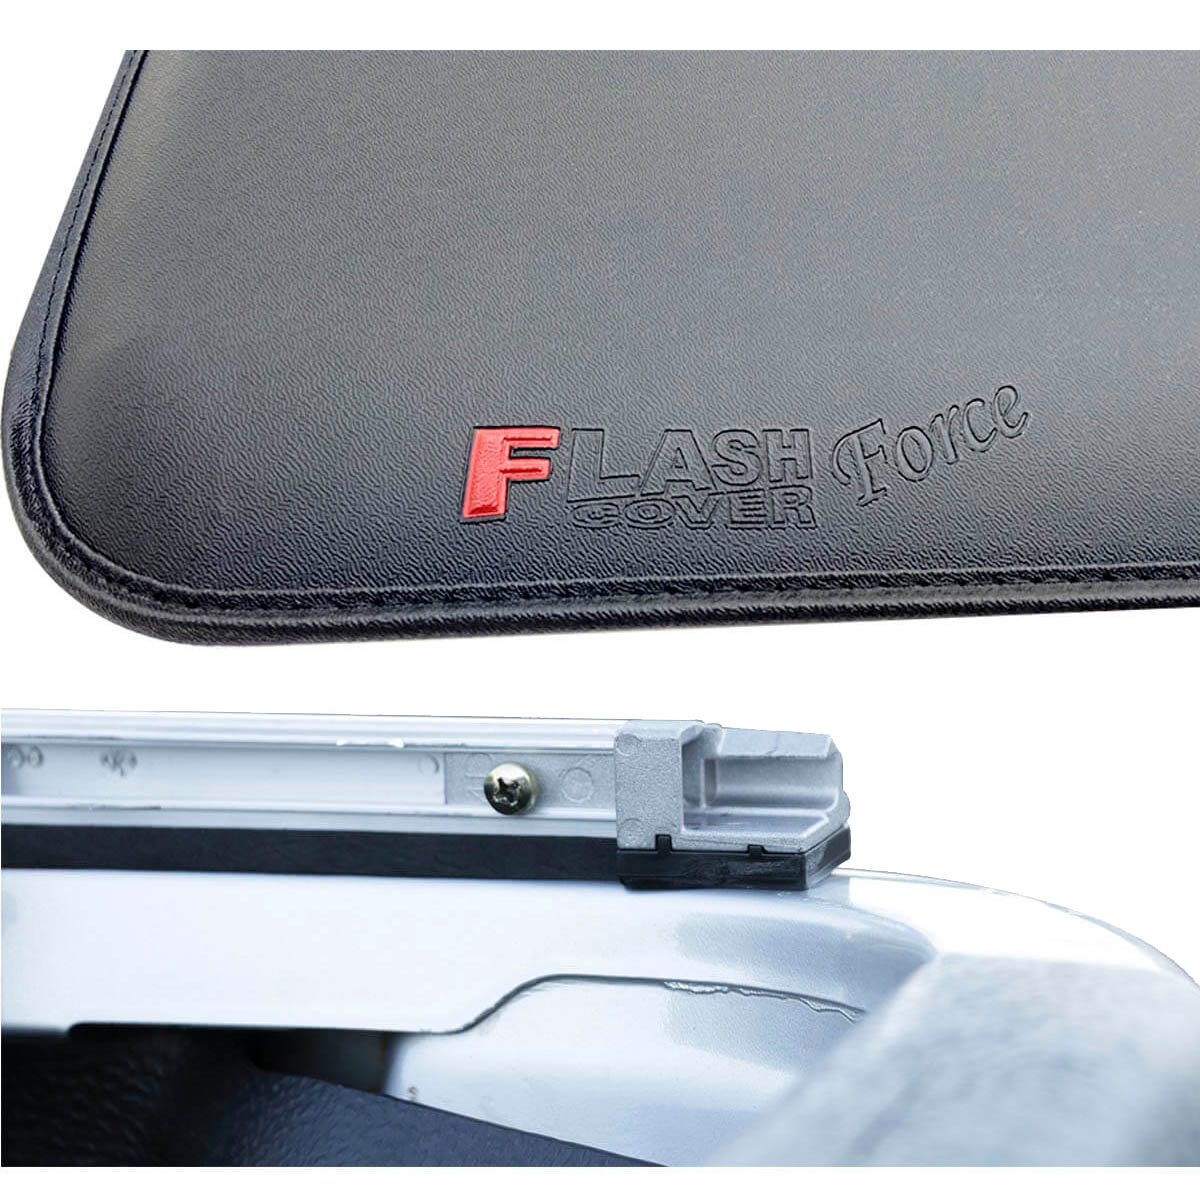 Capota marítima Flash force L200 Sport 2004 a 2007 ou L200 Outdoor 2007 a 2012